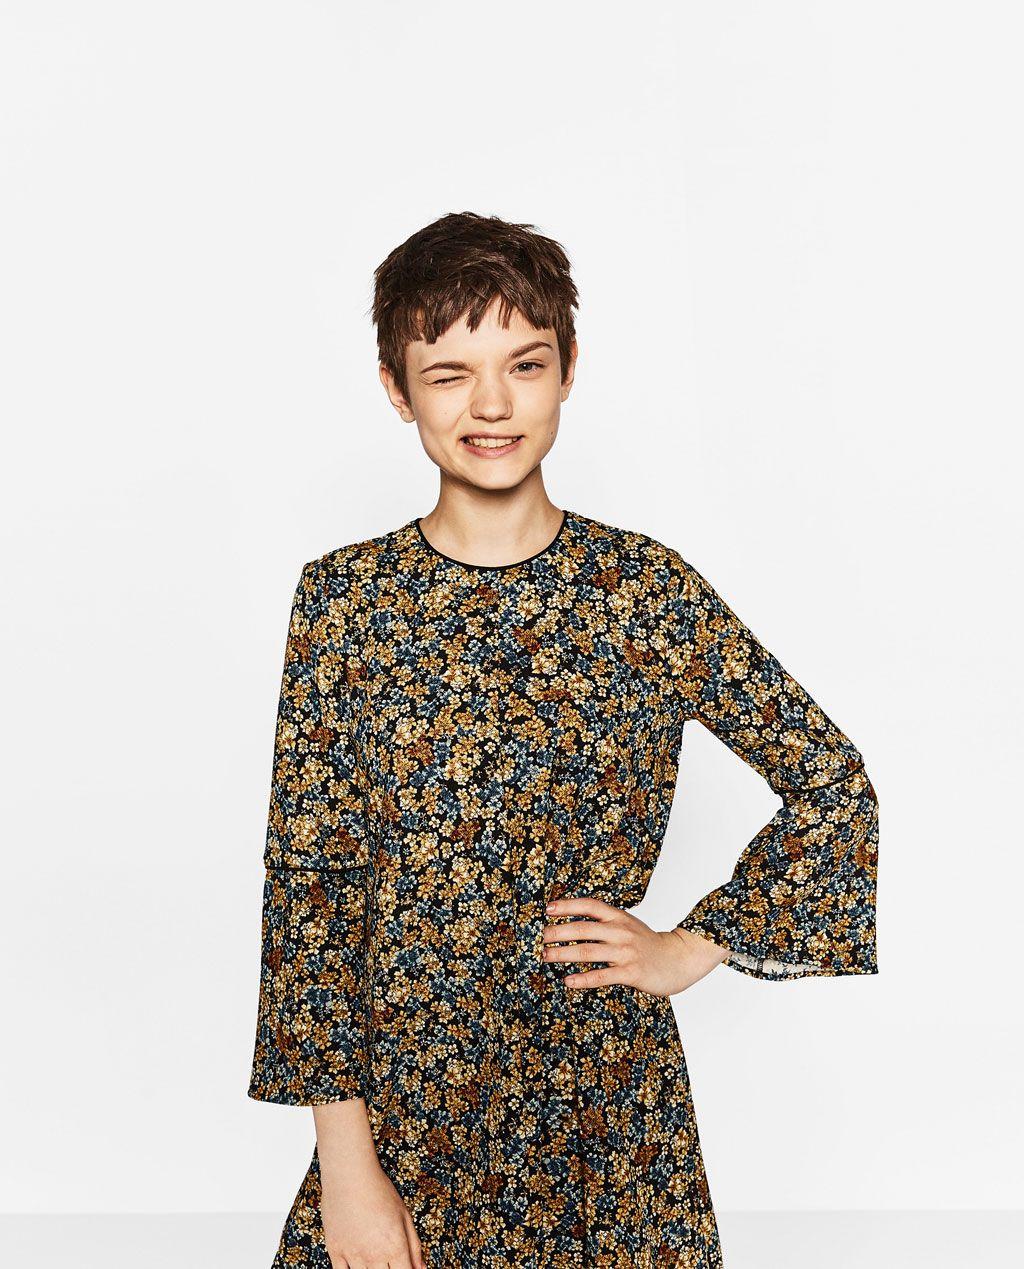 Zara Dan 4 Cicekli Elbise Resmi Cicekli Elbise The Dress Zara